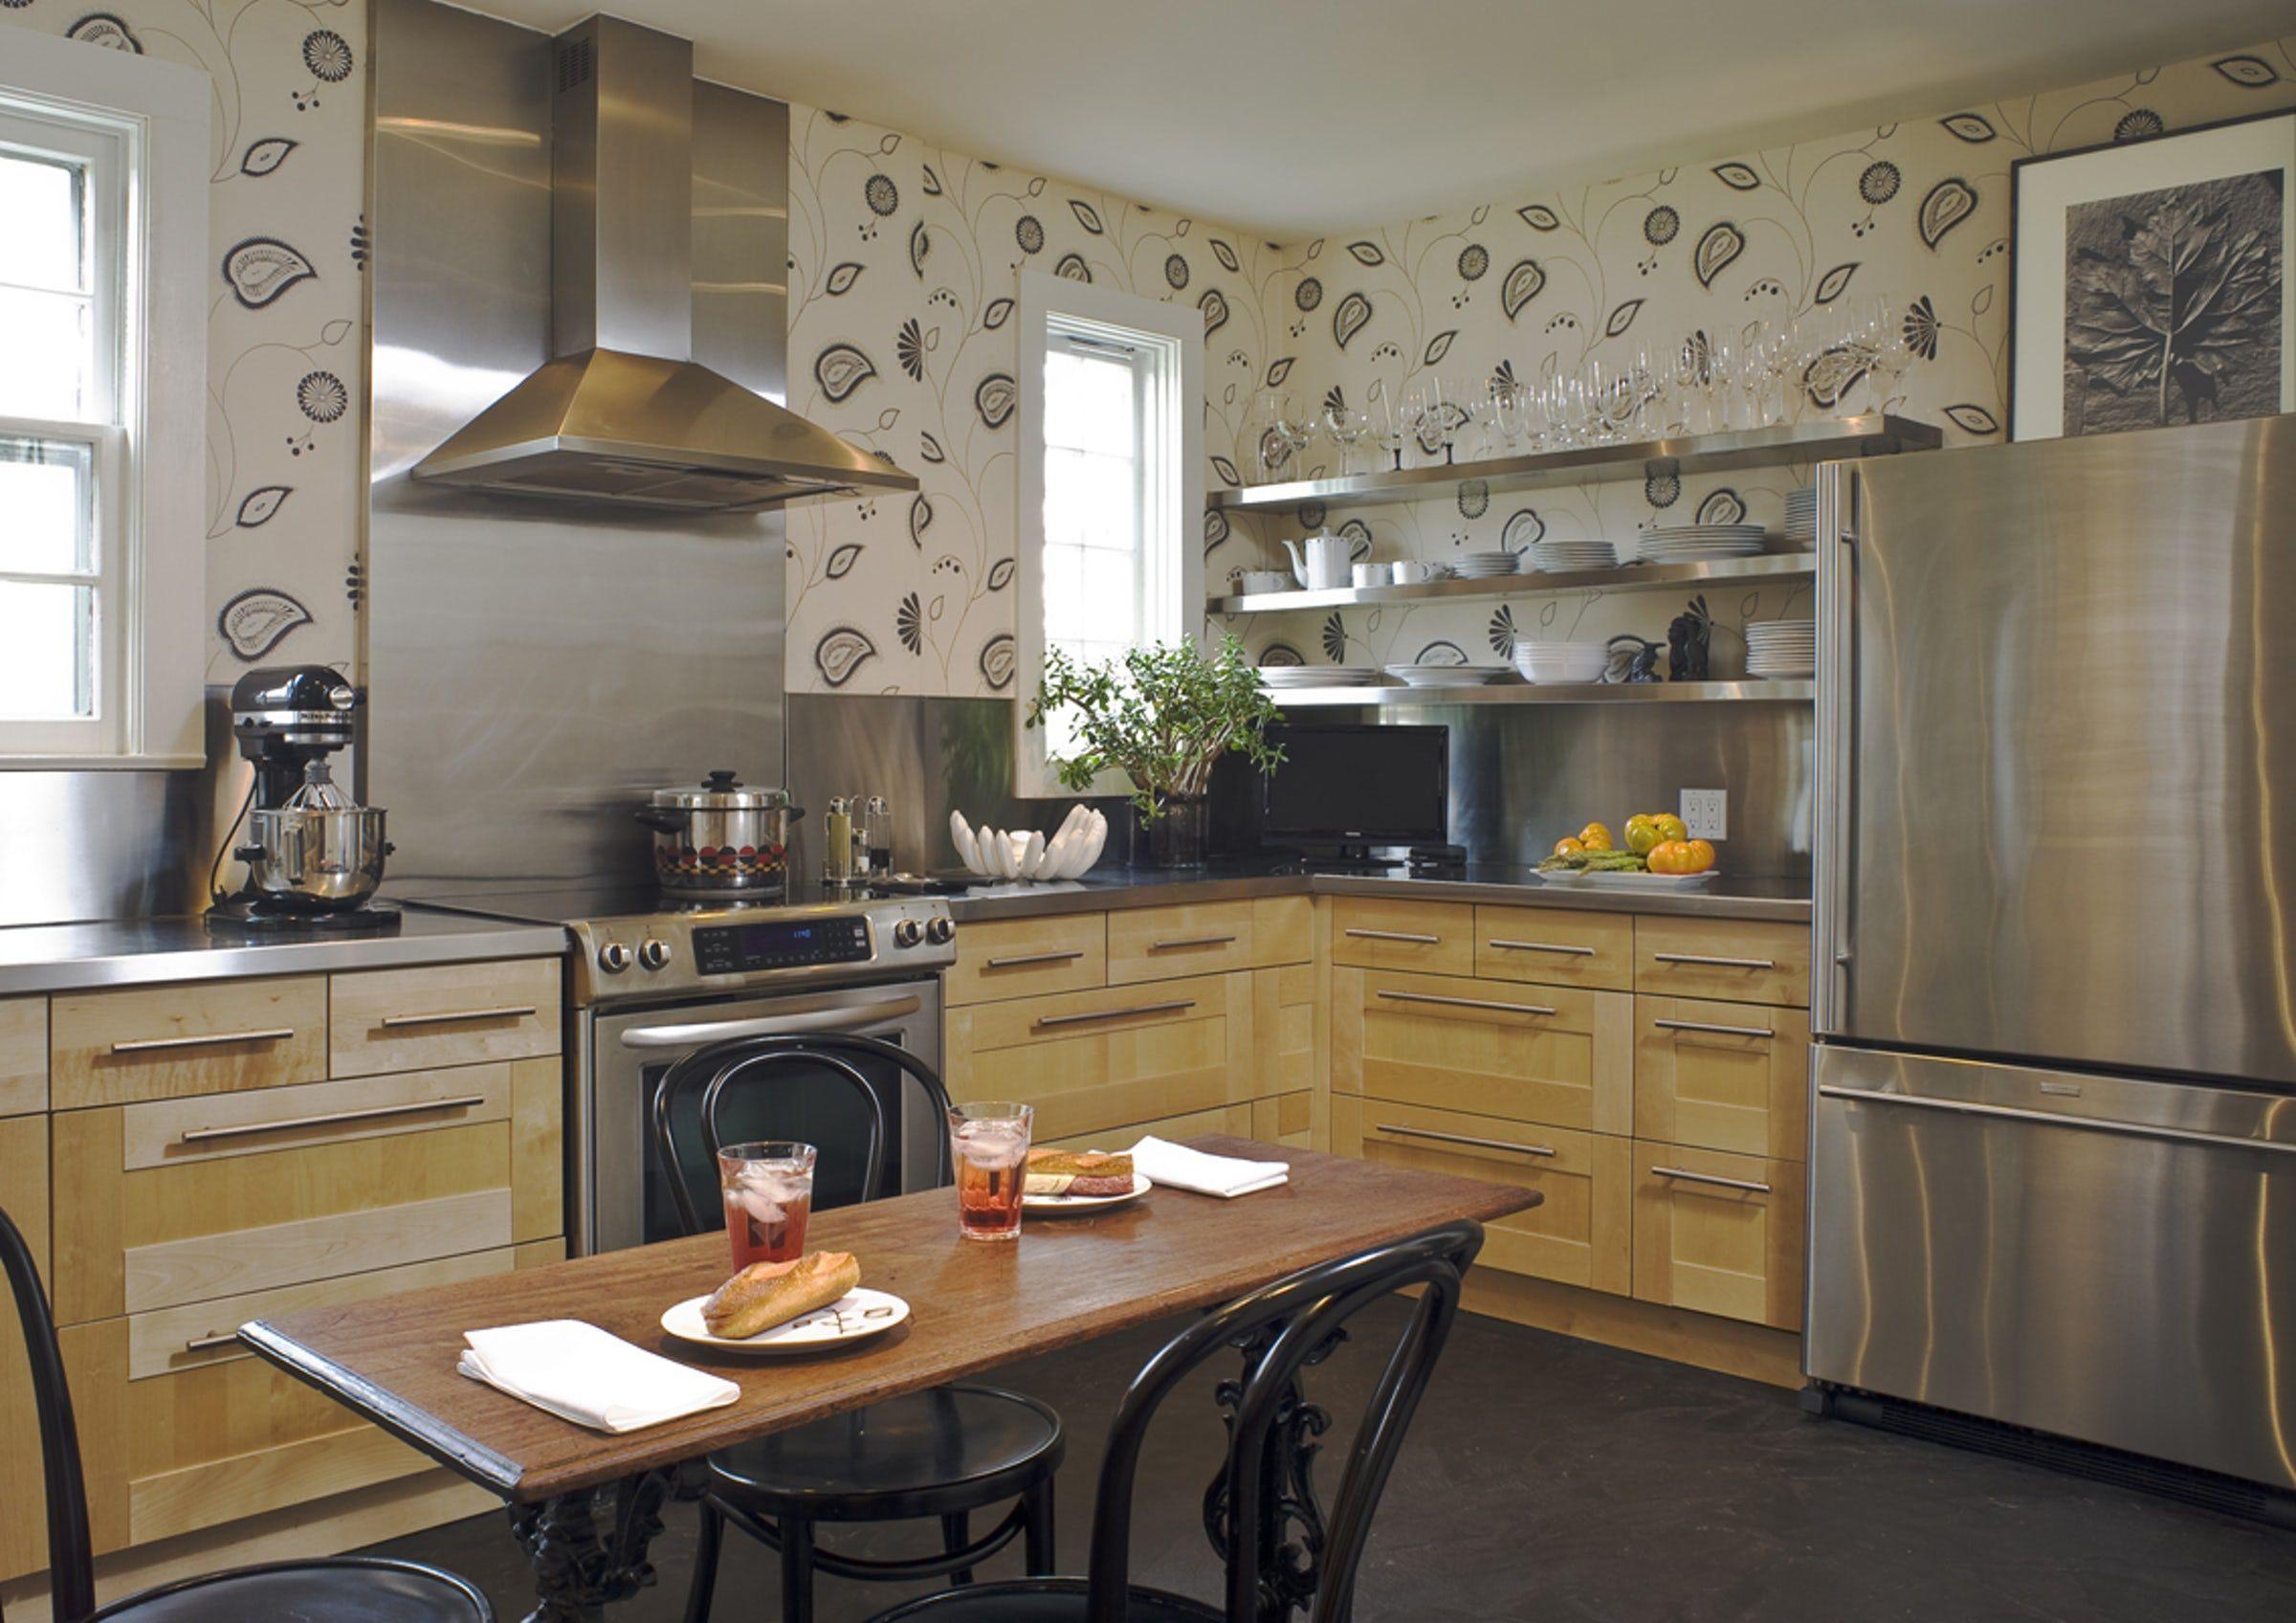 Free Download Gorgeous Kitchen Wallpaper Ideas Best Wallpaper For